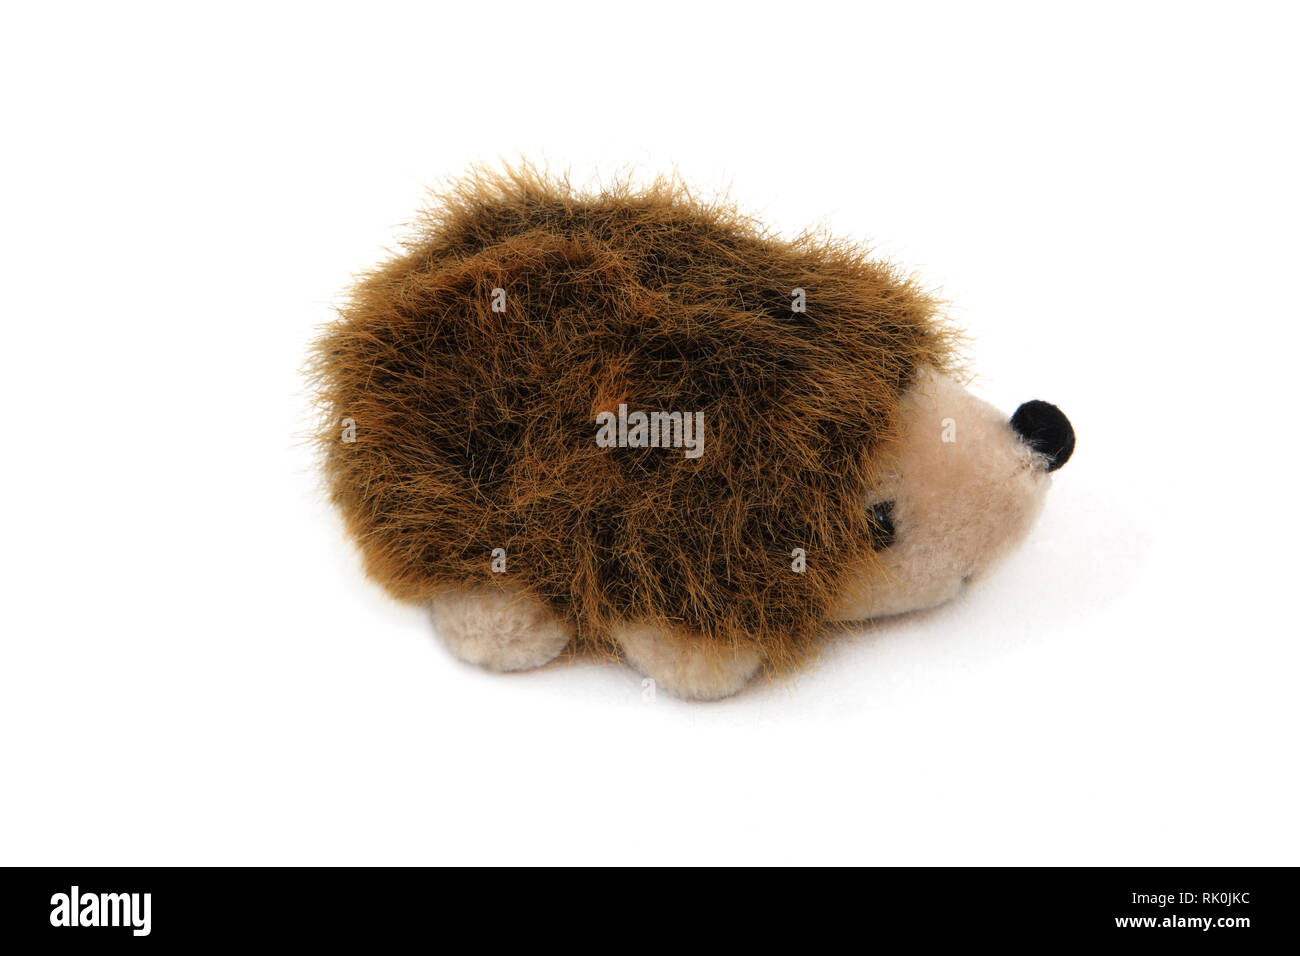 Toy Hedgehog - Stock Image